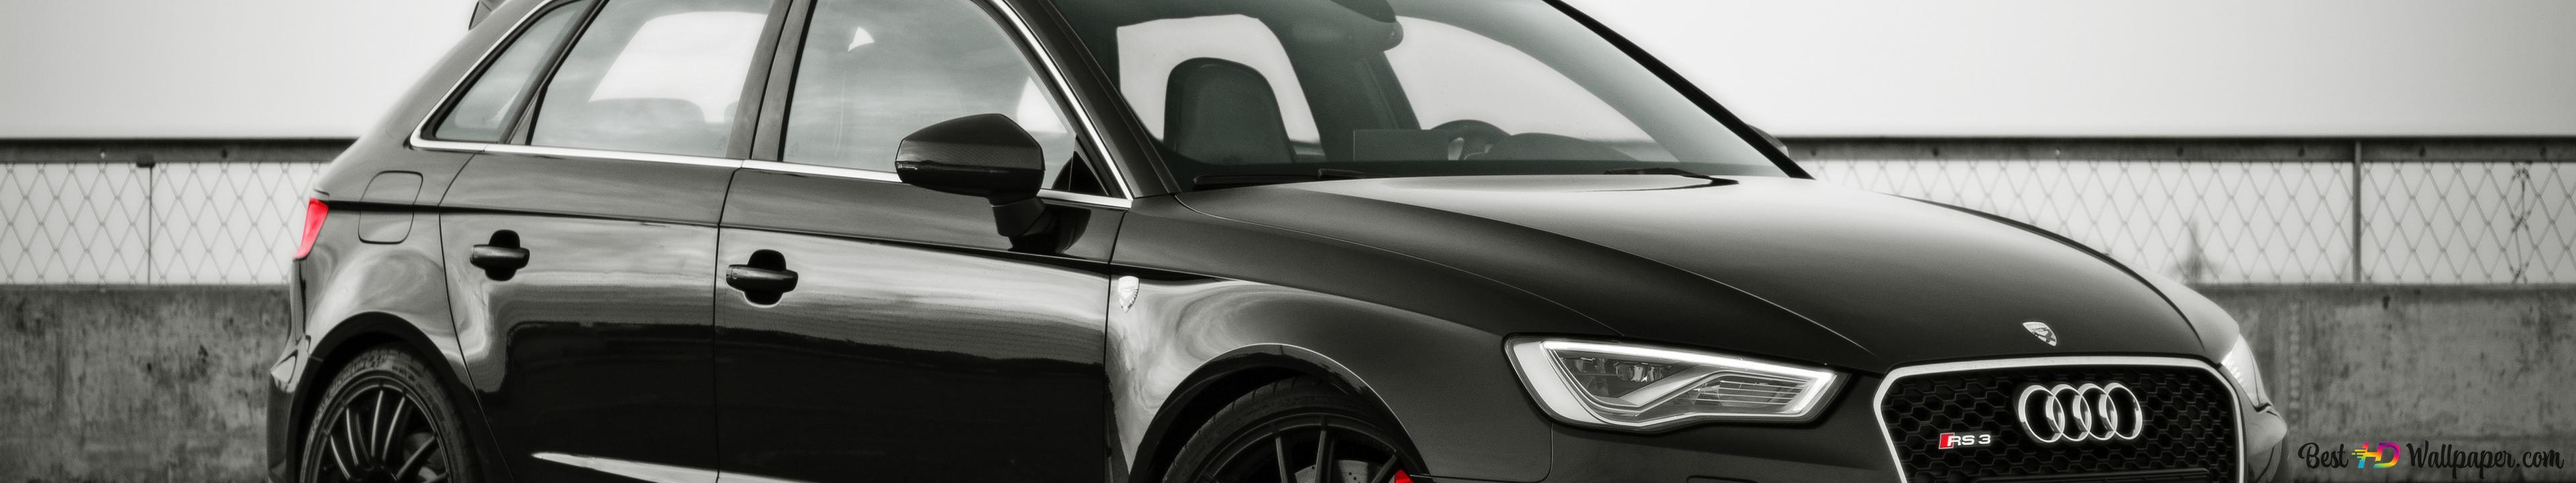 Black Audi Rs3 Sport Car Hd Wallpaper Download